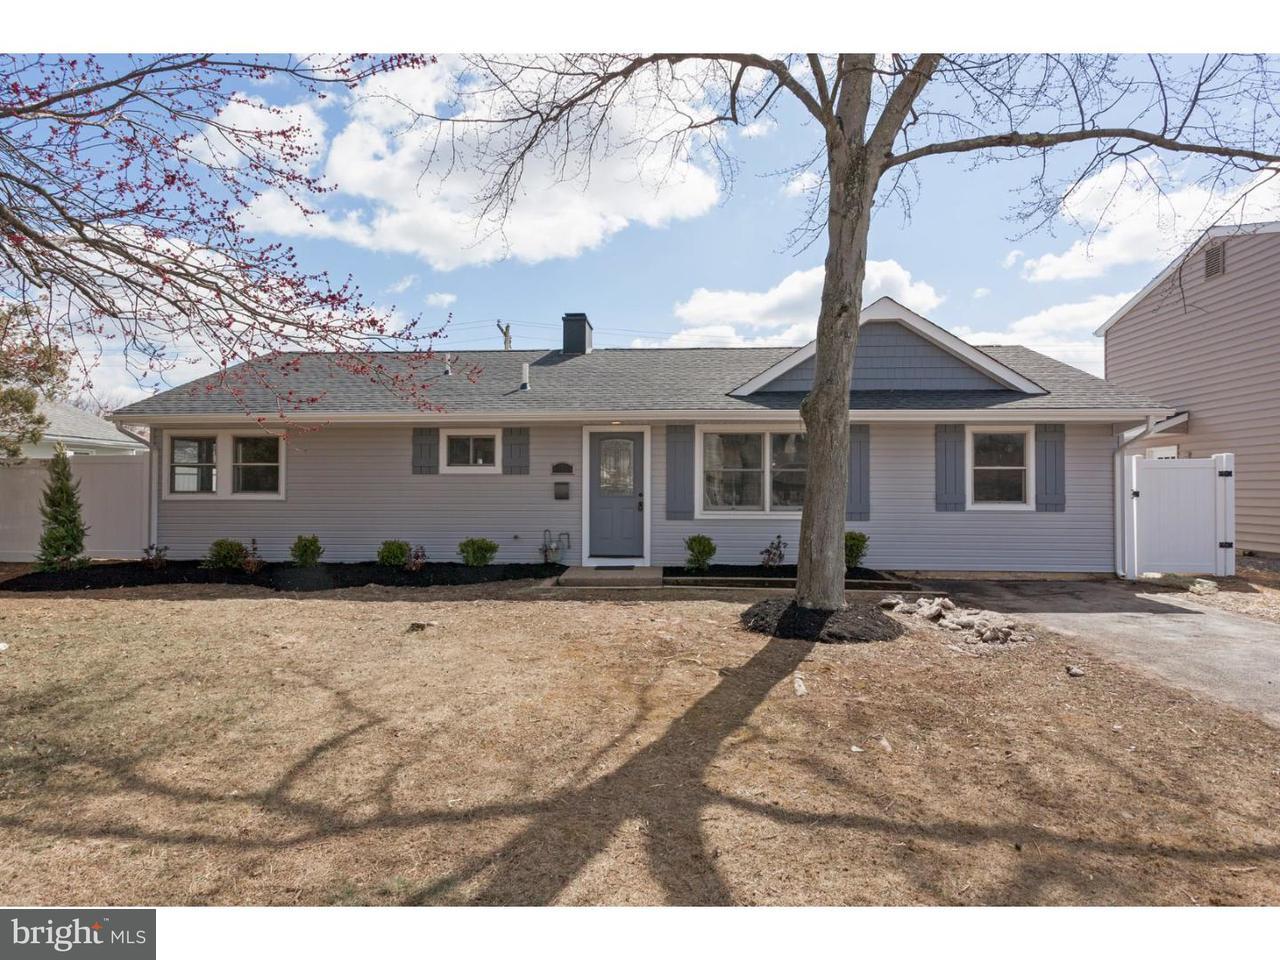 Single Family Home for Sale at 716 AUBURN Road Fairless Hills, Pennsylvania 19030 United States